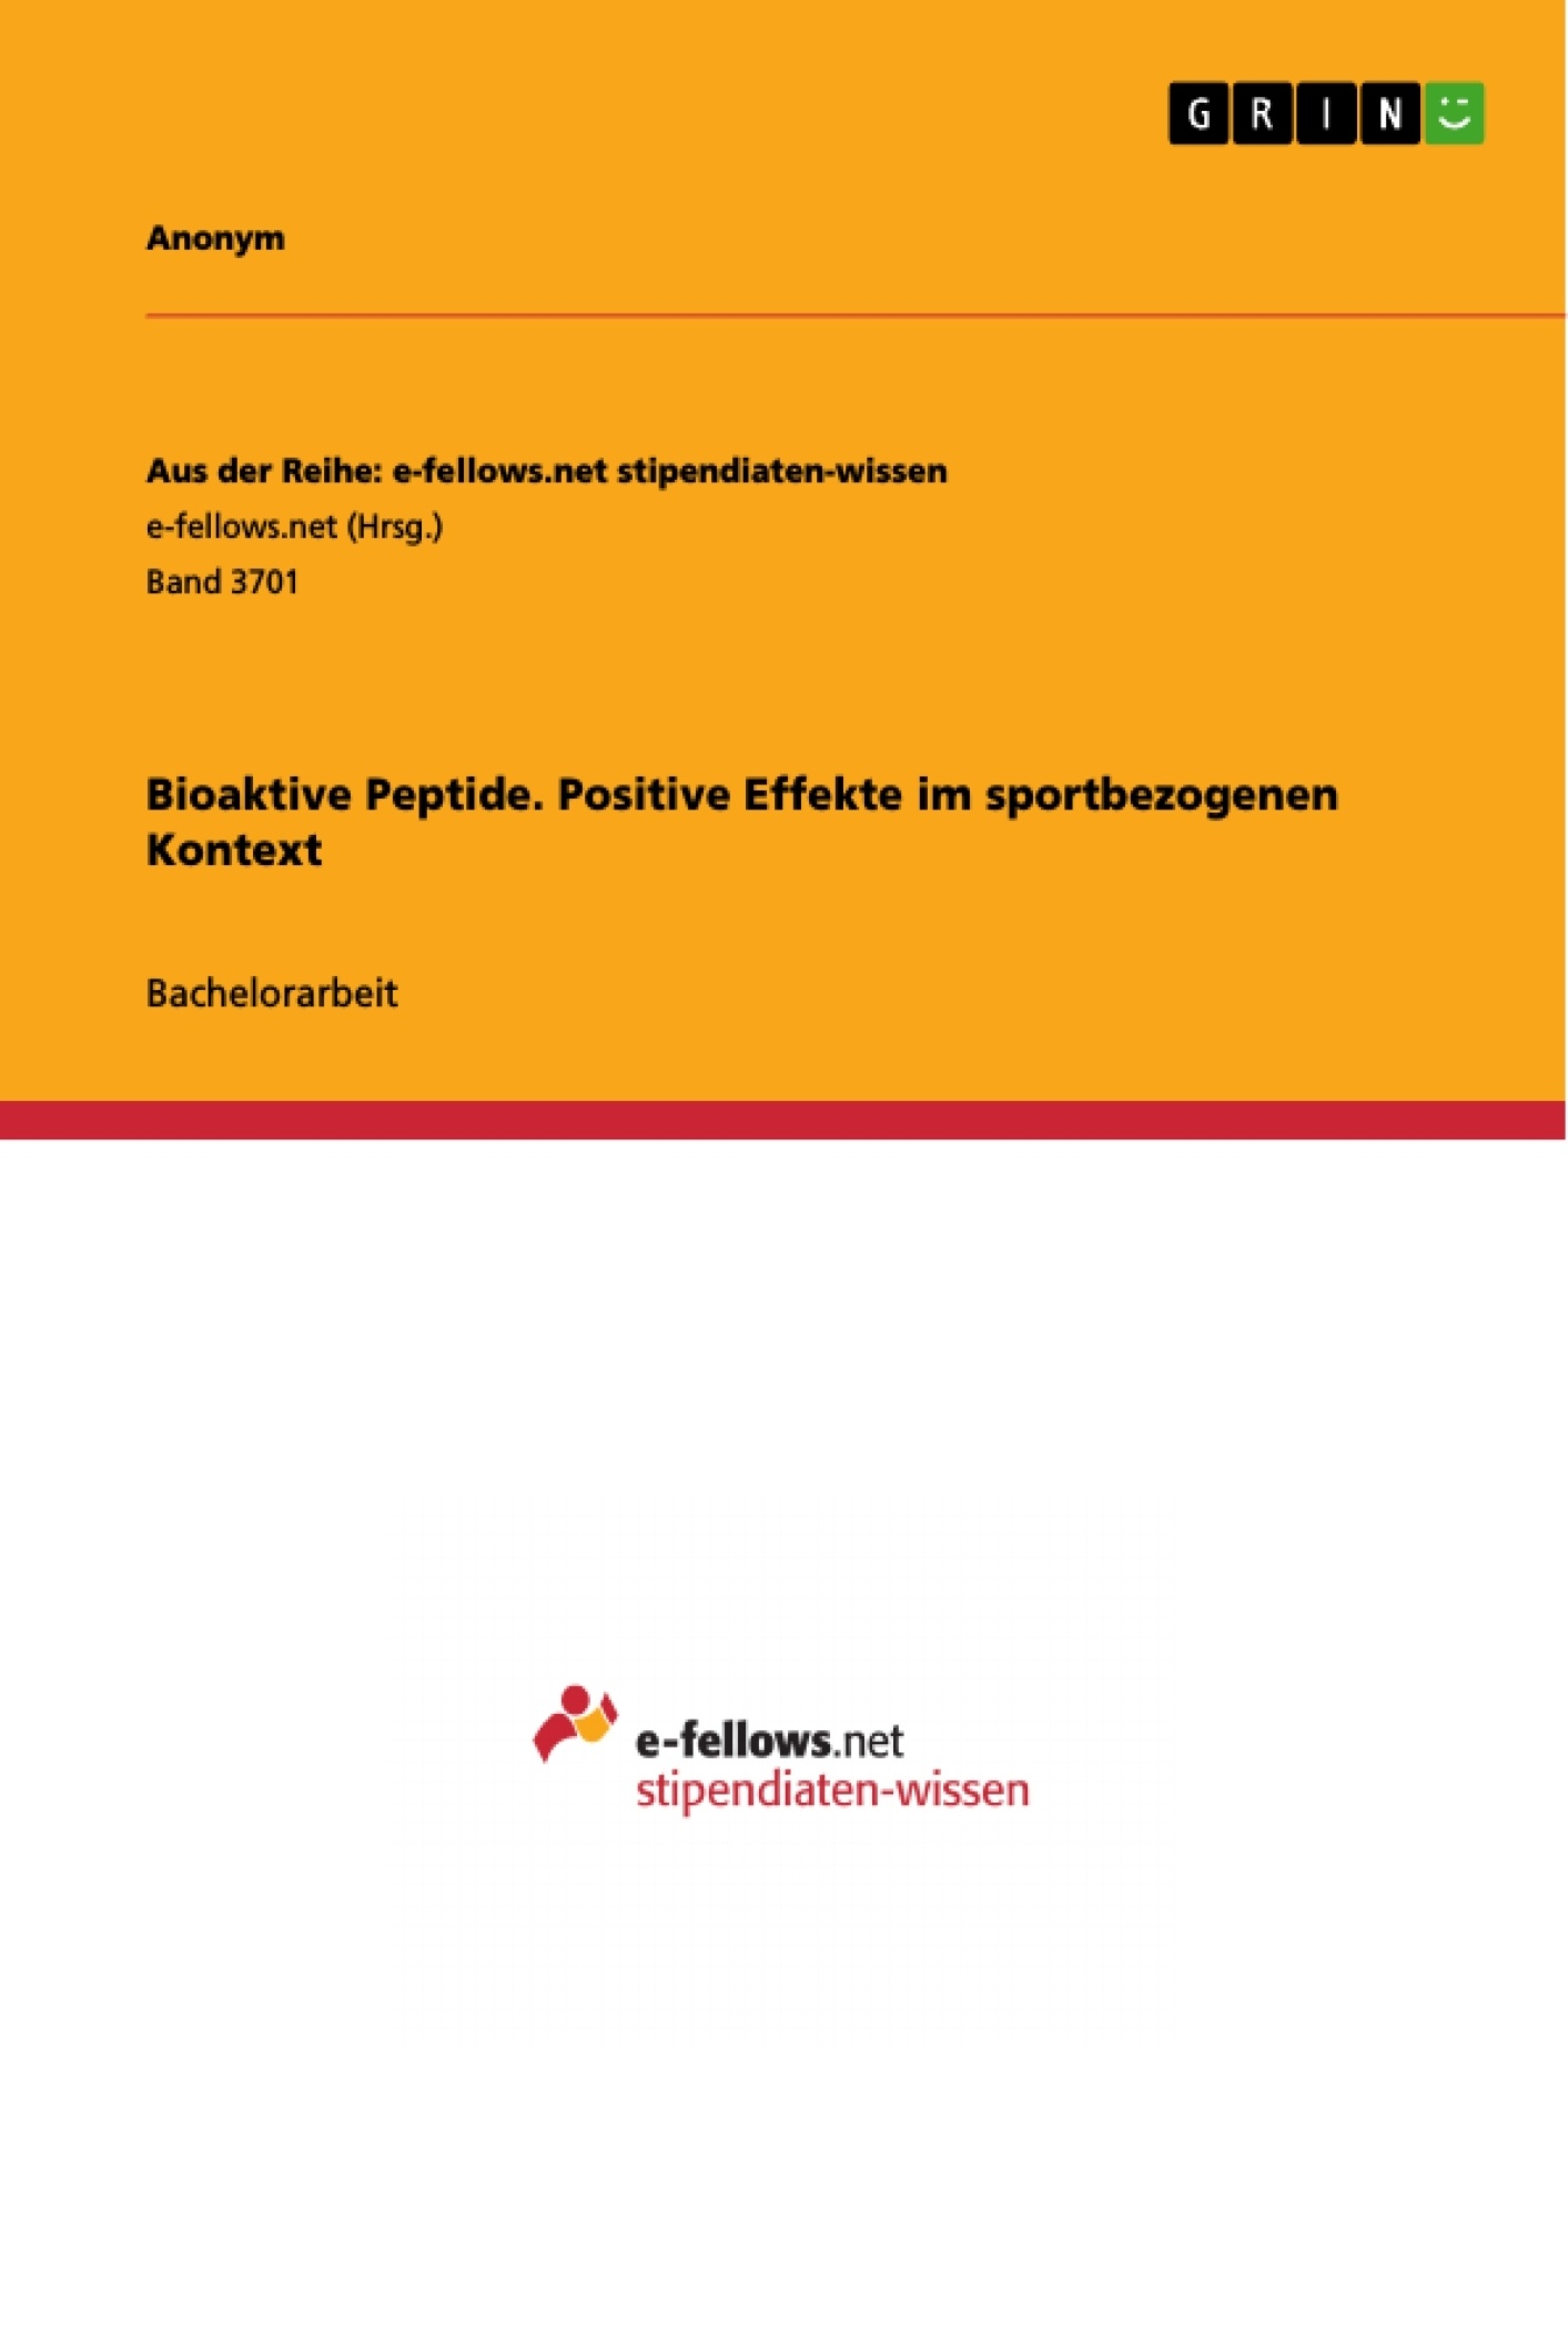 Titel: Bioaktive Peptide. Positive Effekte im sportbezogenen Kontext